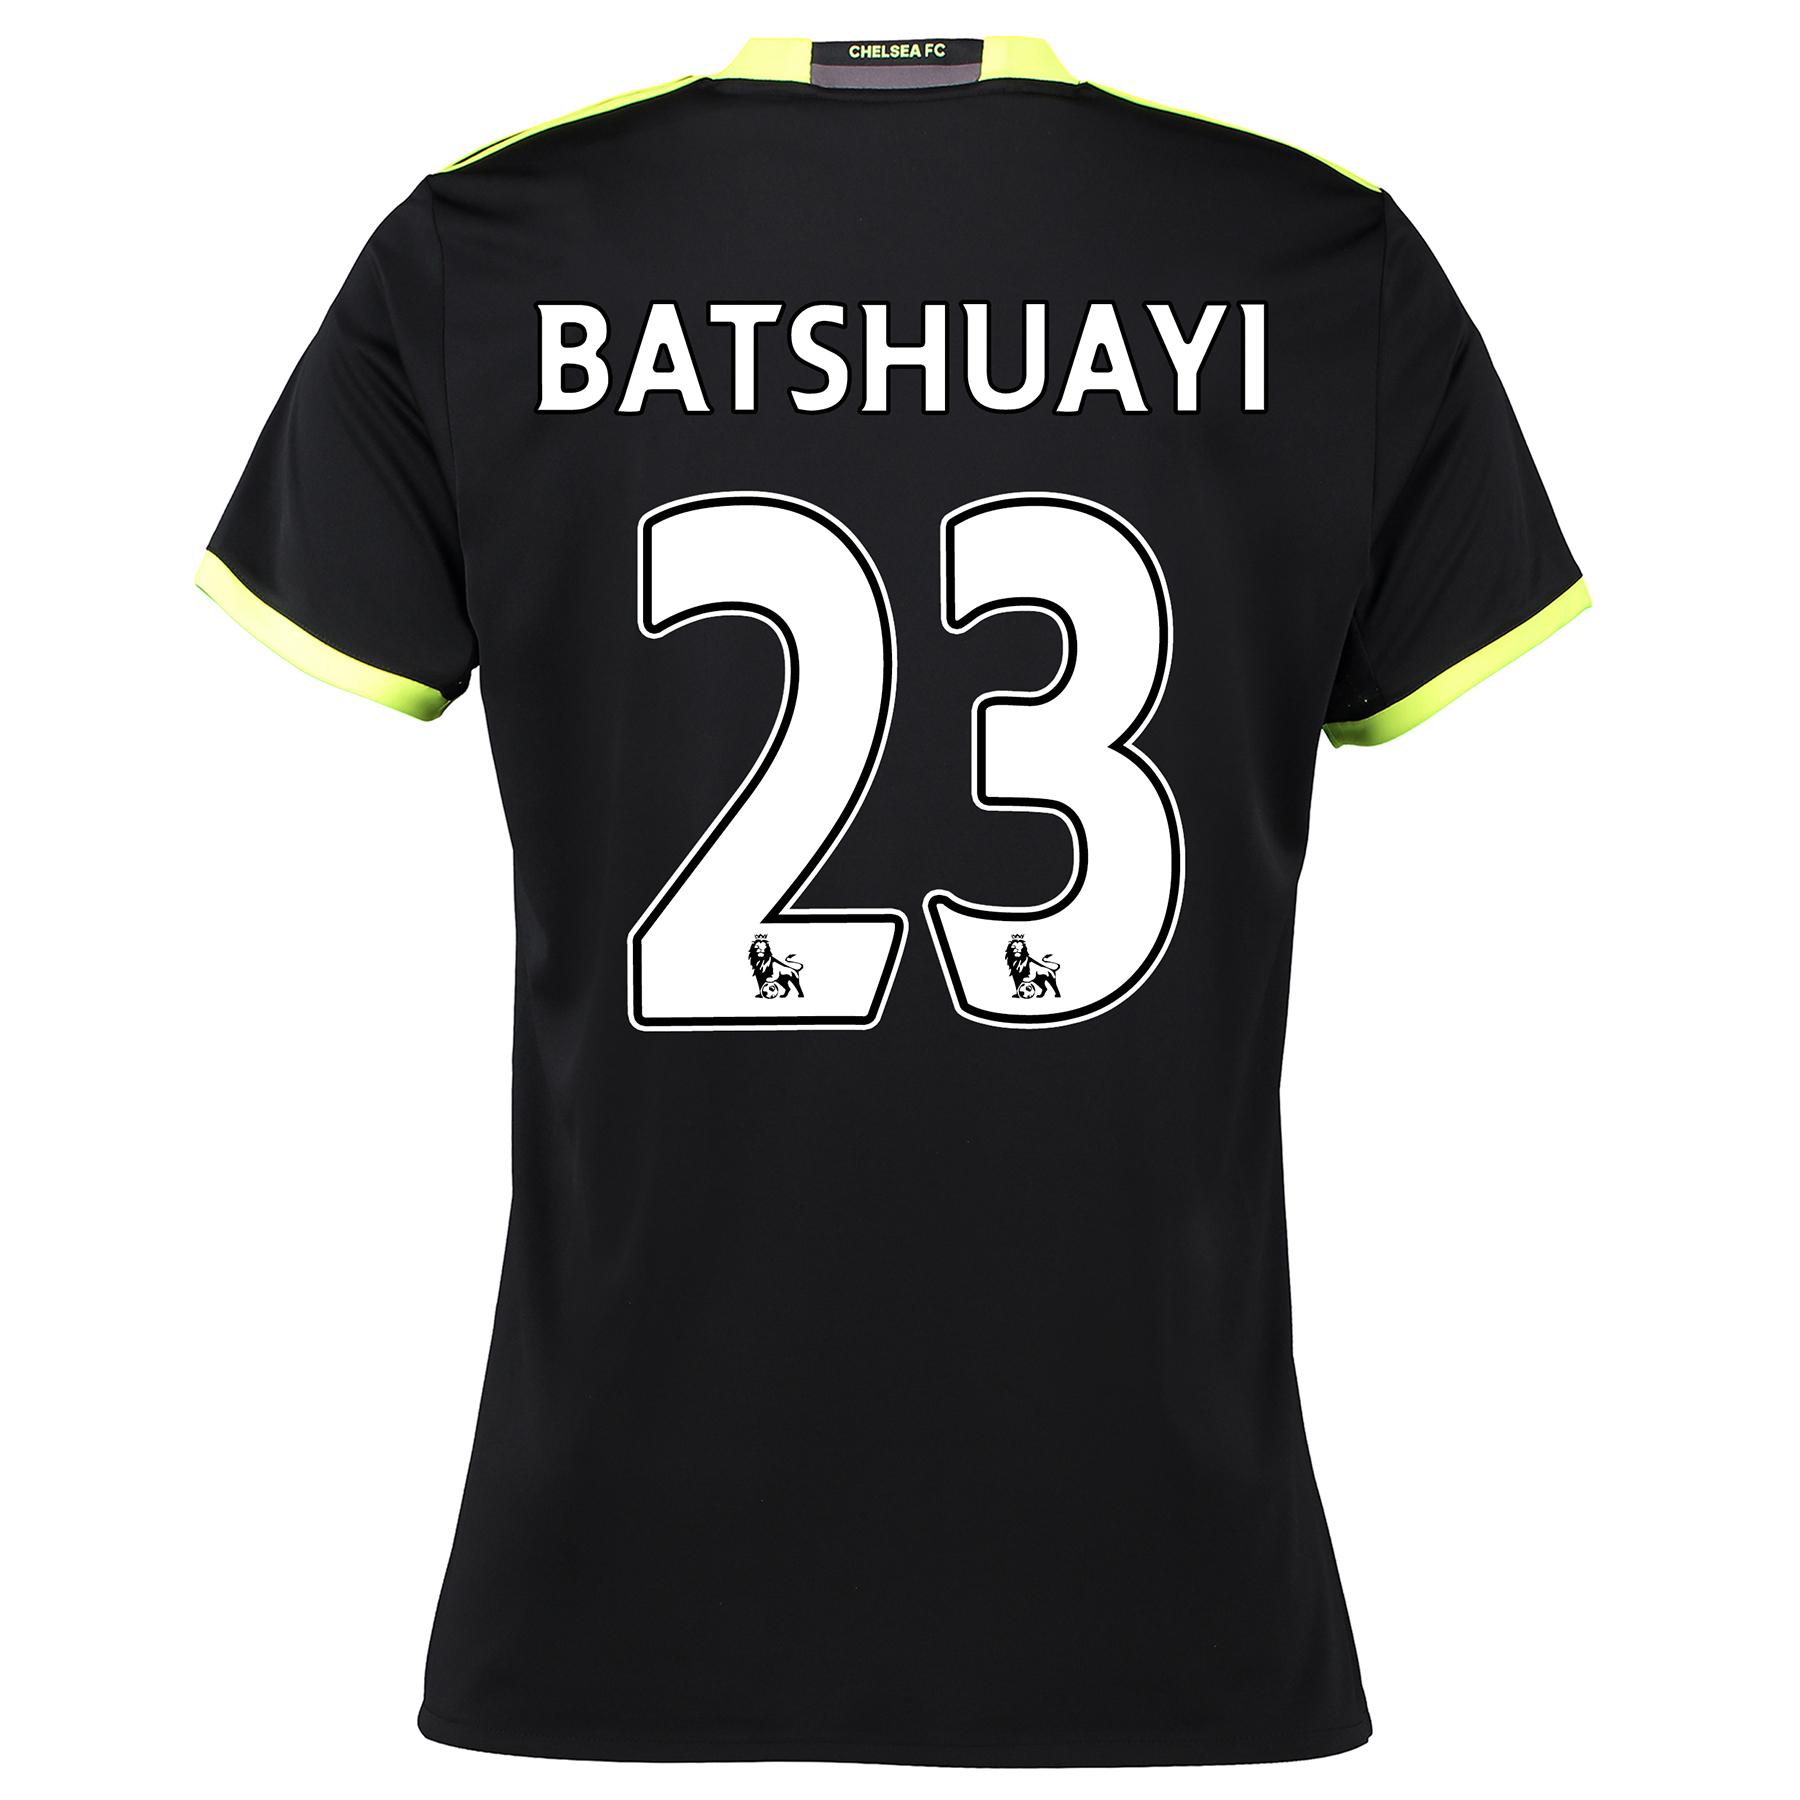 Chelsea Away Shirt 16-17 - Womens with Batshuayi 23 printing